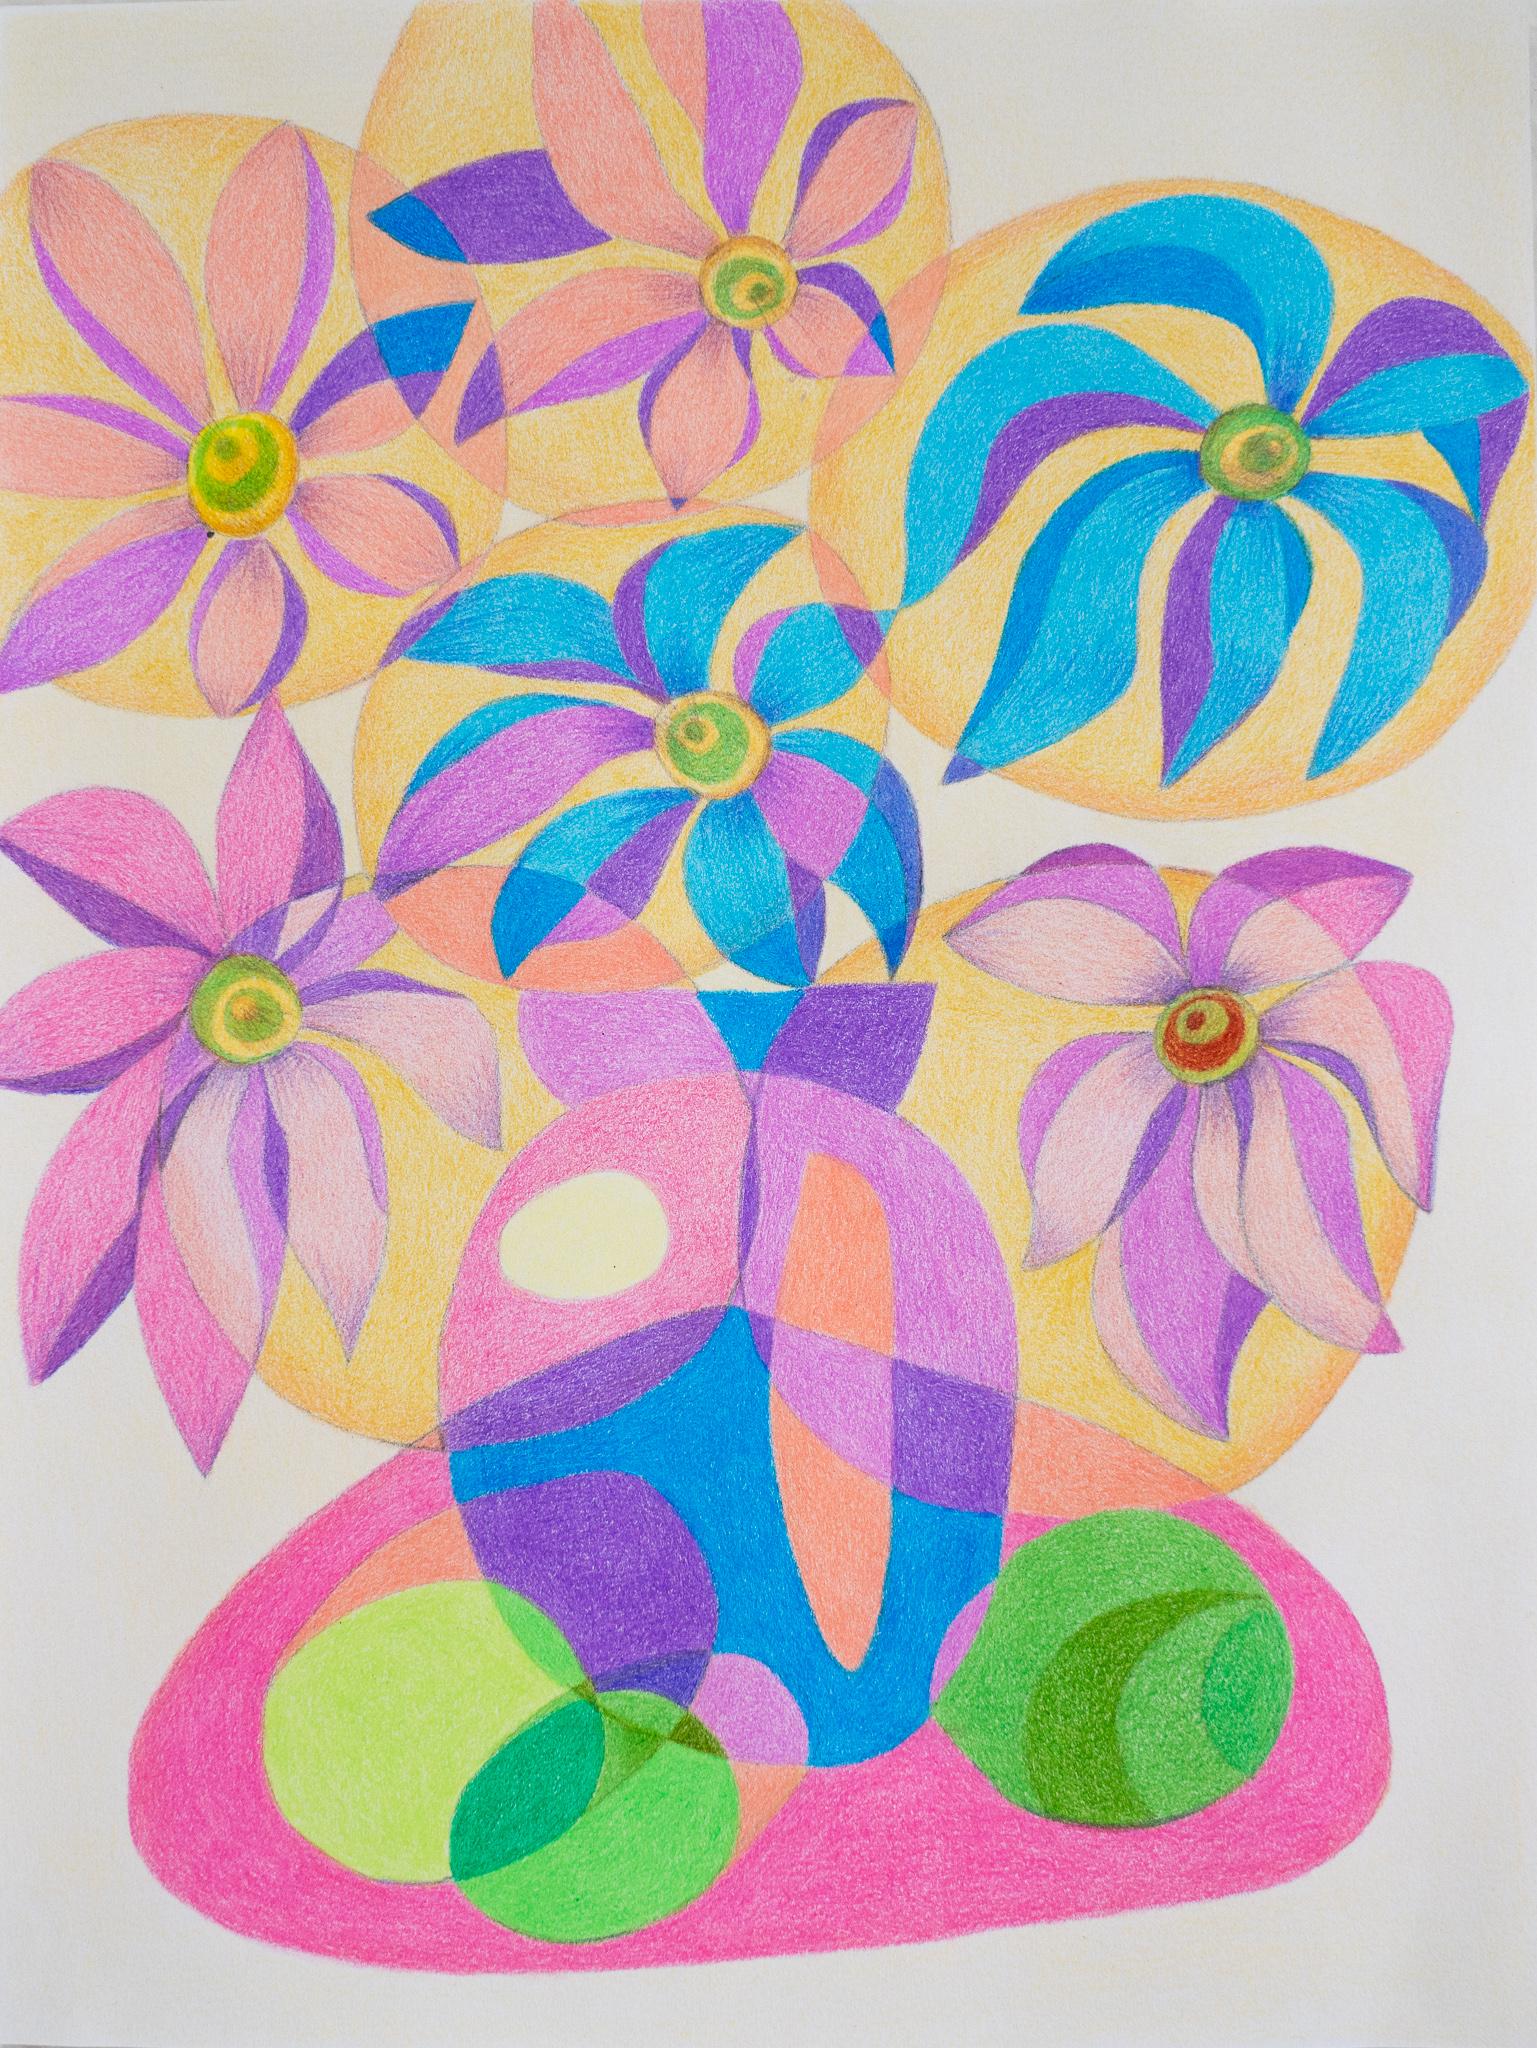 Still Life artwork by Galina Misnikova - art listed for sale on Artplode